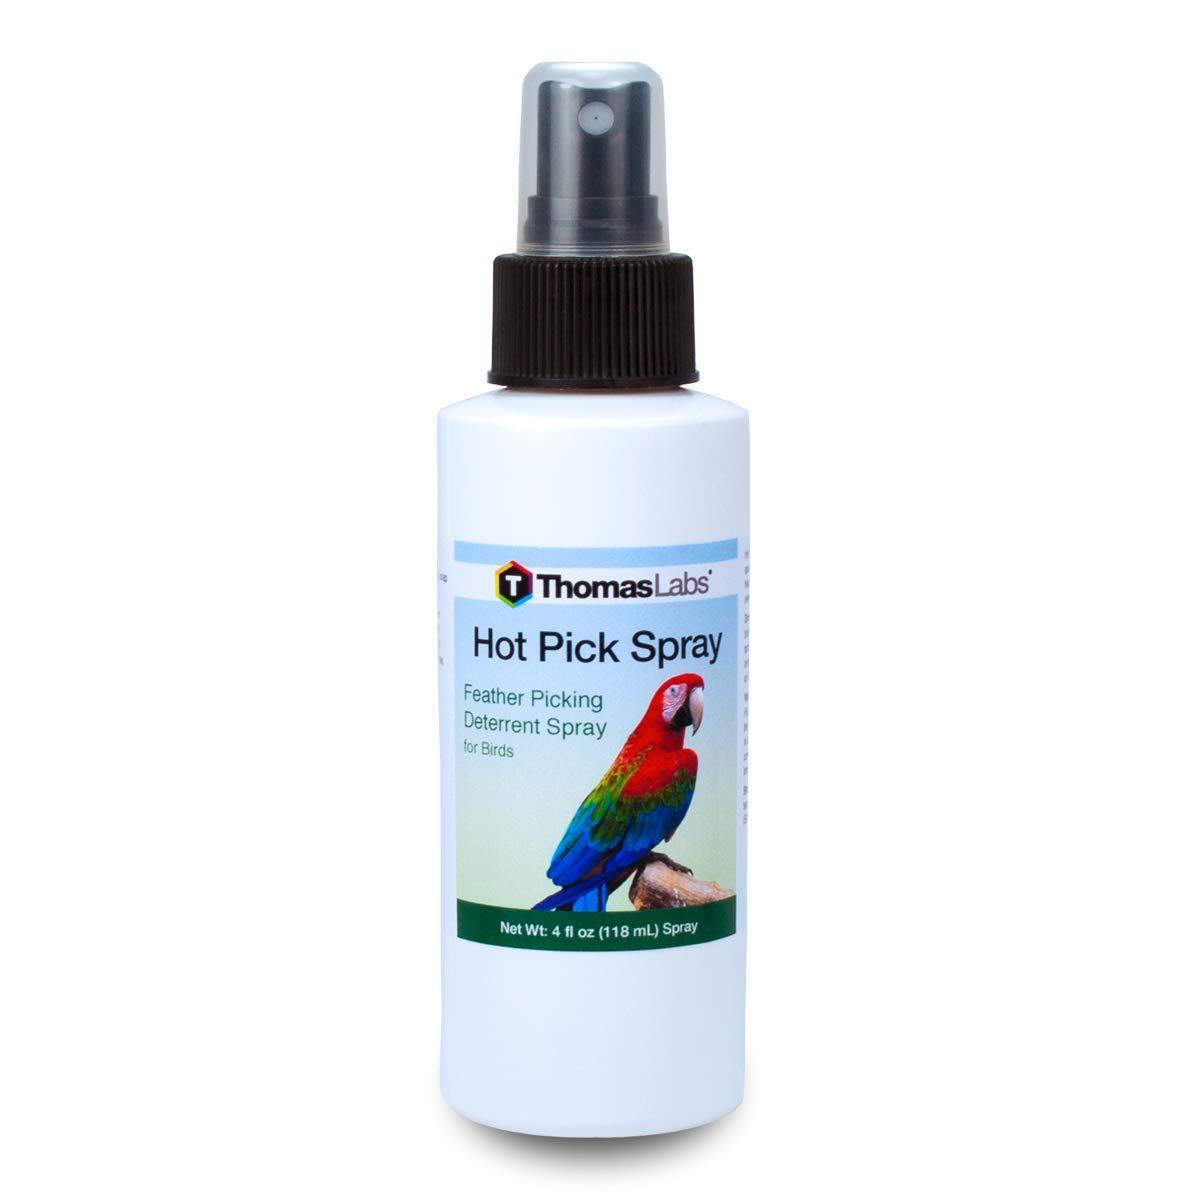 Thomas Laboratories Hot Pick Spray, 4 Fluid Ounce by Thomas Labs